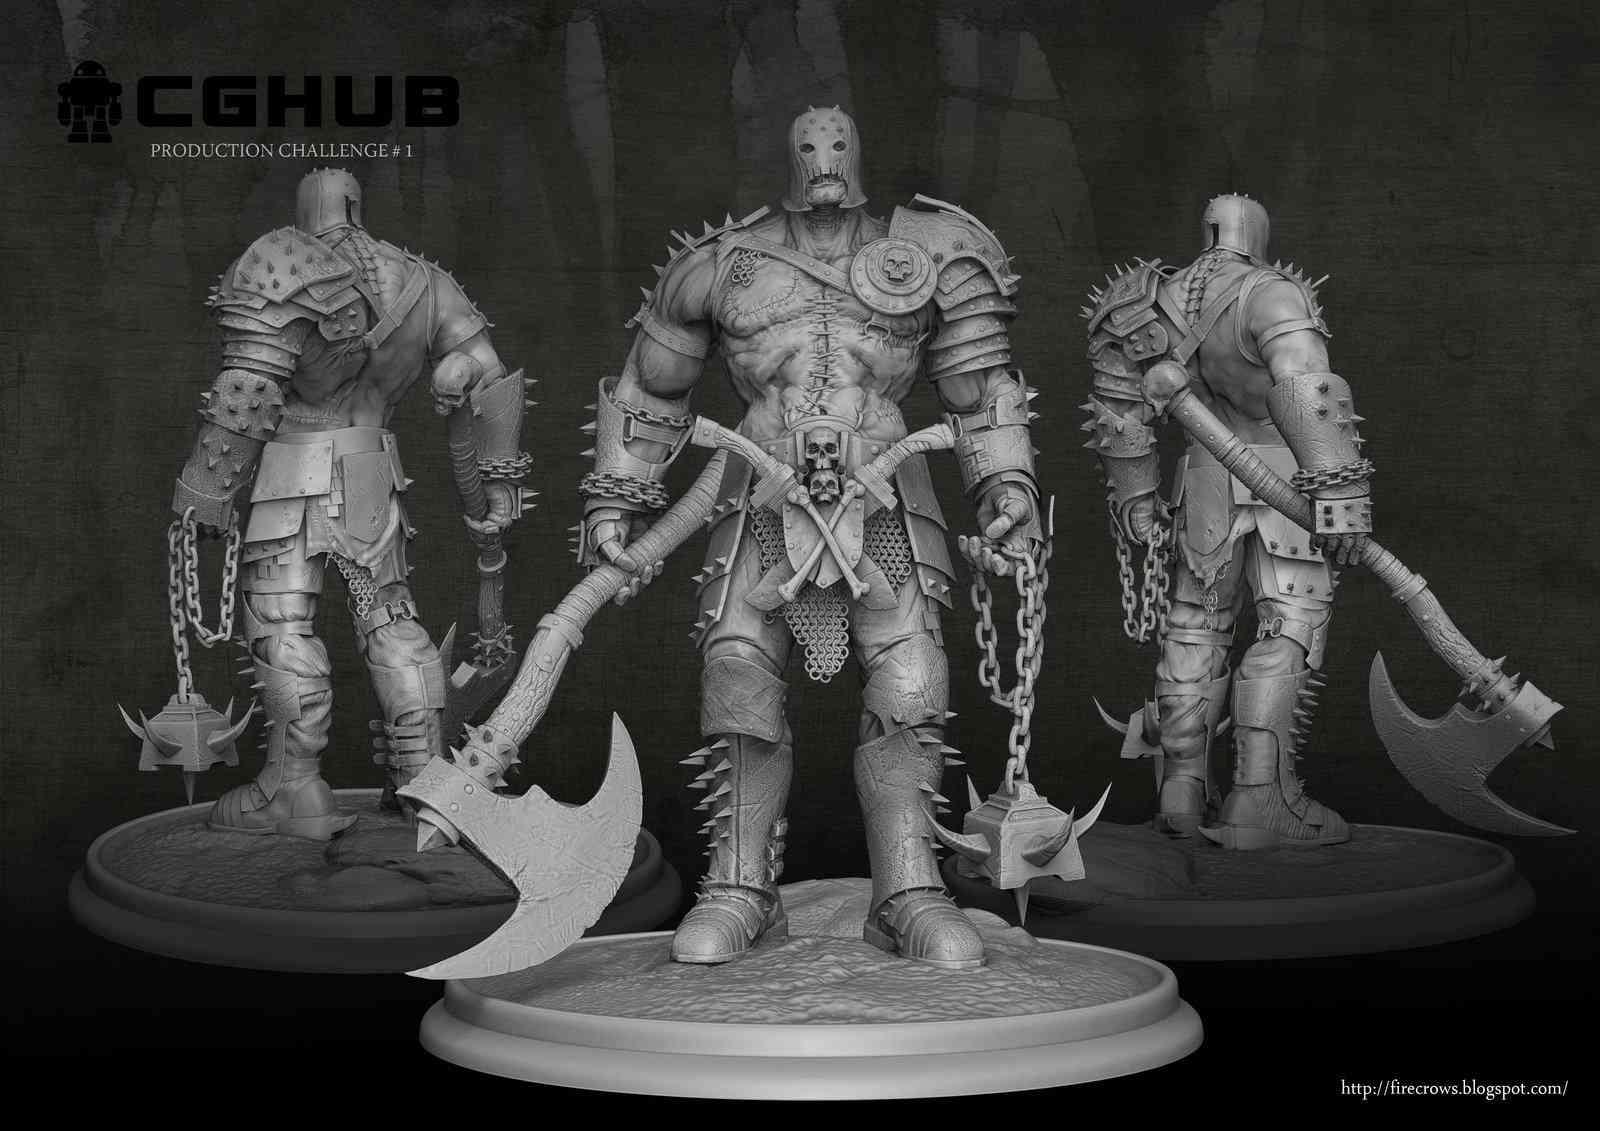 CG Hub comp Model by firecrow78 Ultra gump blaster mega pack ultimate post de monstros  5